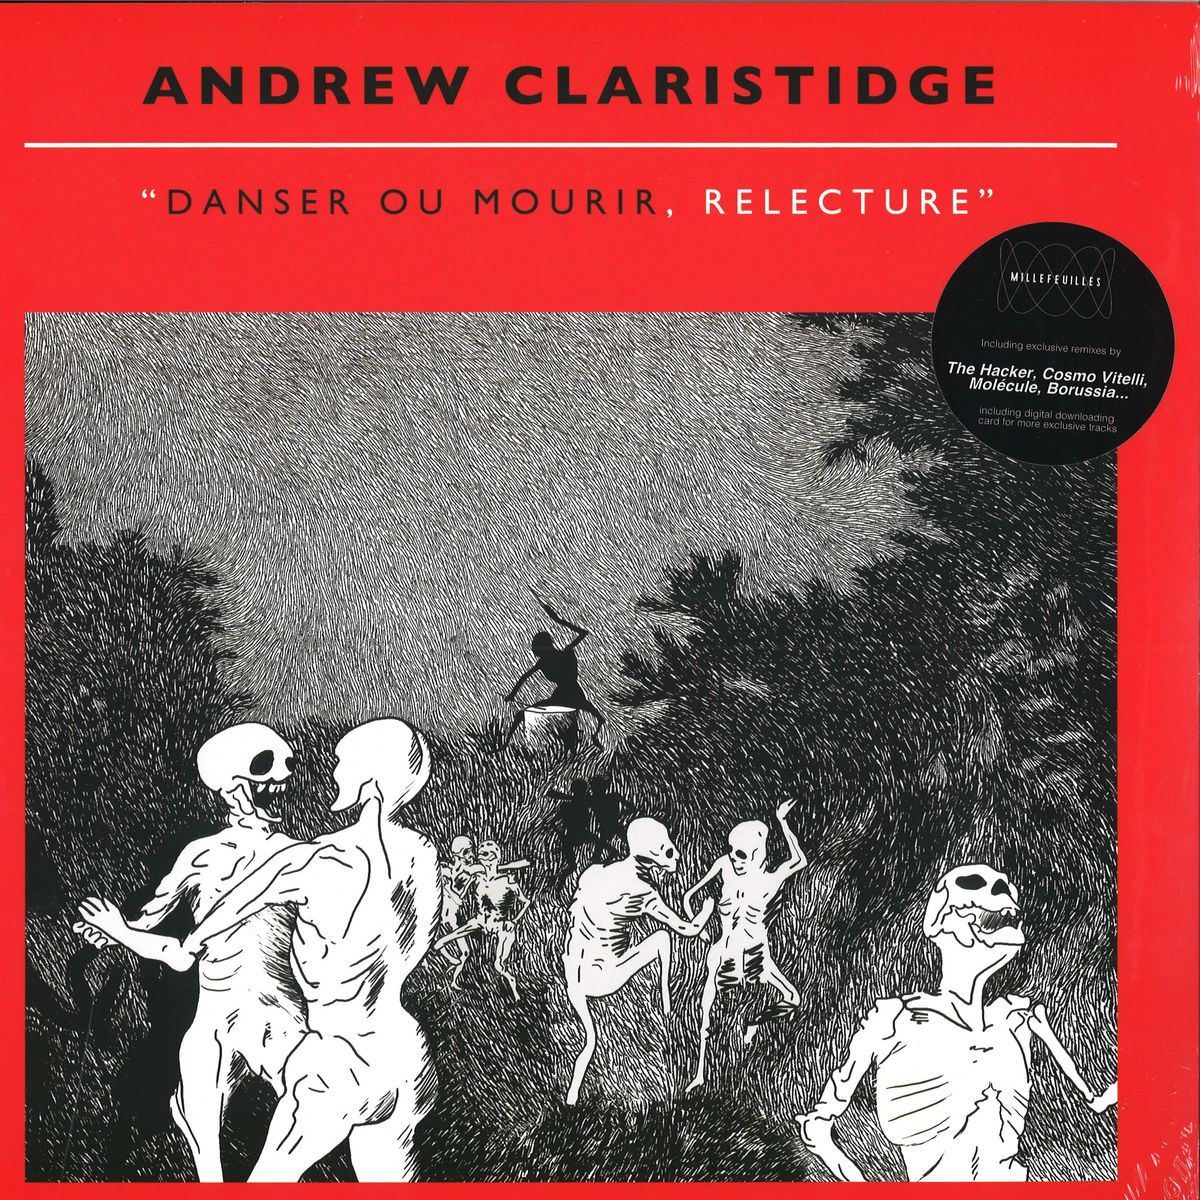 Andrew Claristidge - Danser ou Mourir, Relecture (Mille Feuilles)